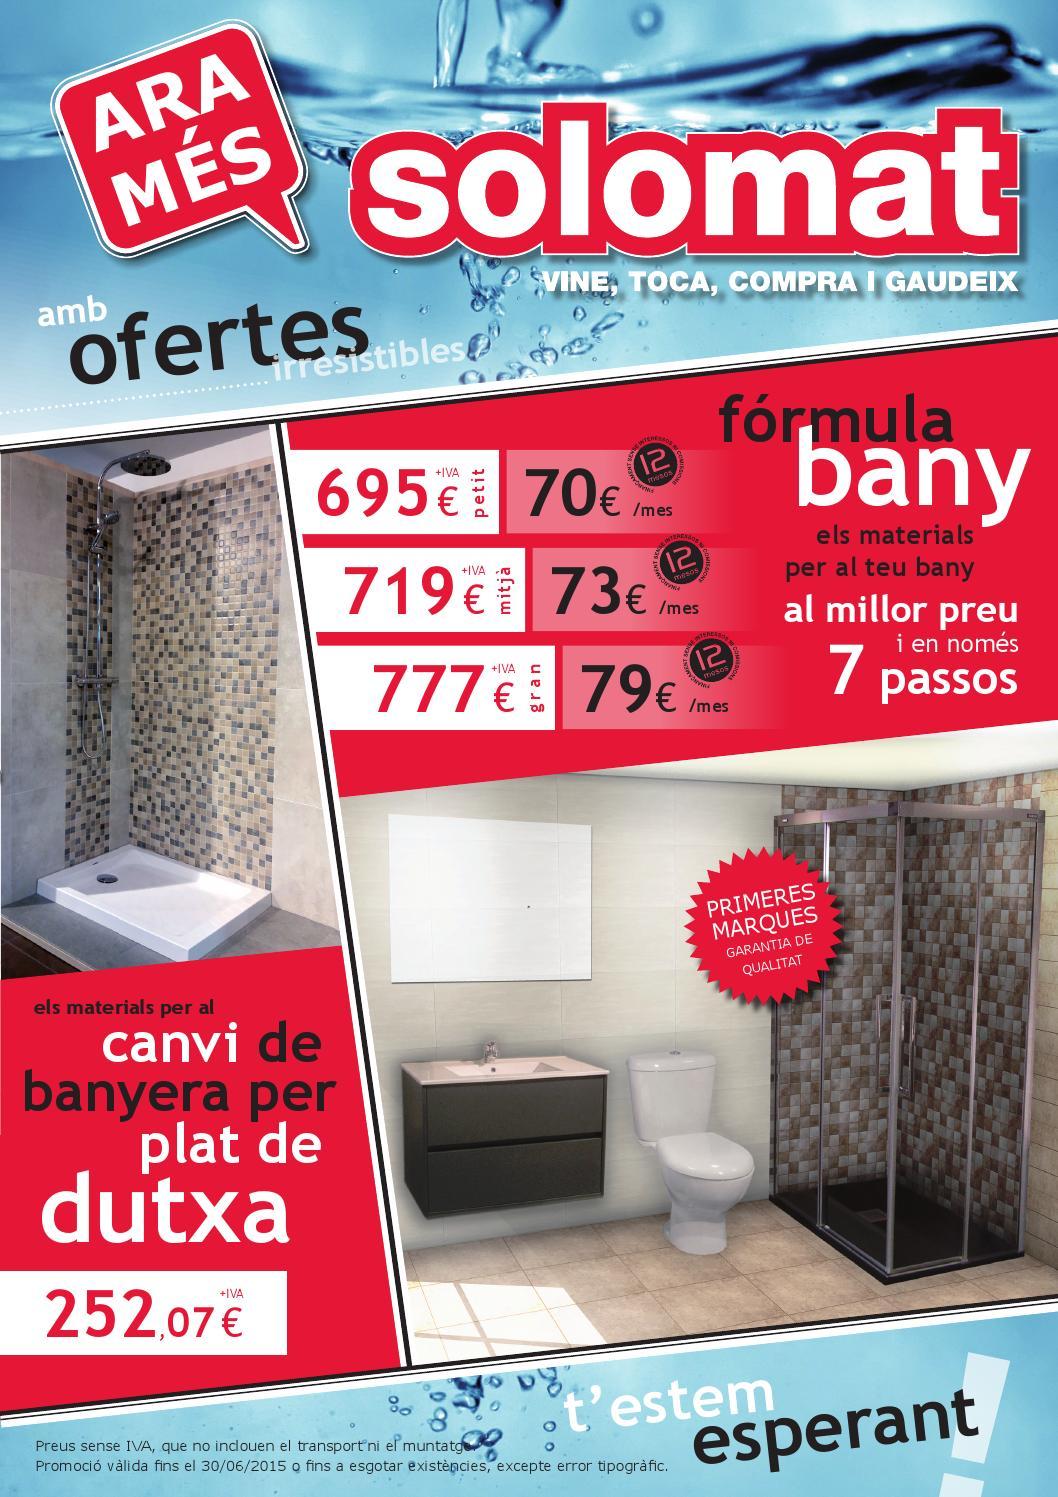 F rmula bany by solomat issuu for Plats de dutxa